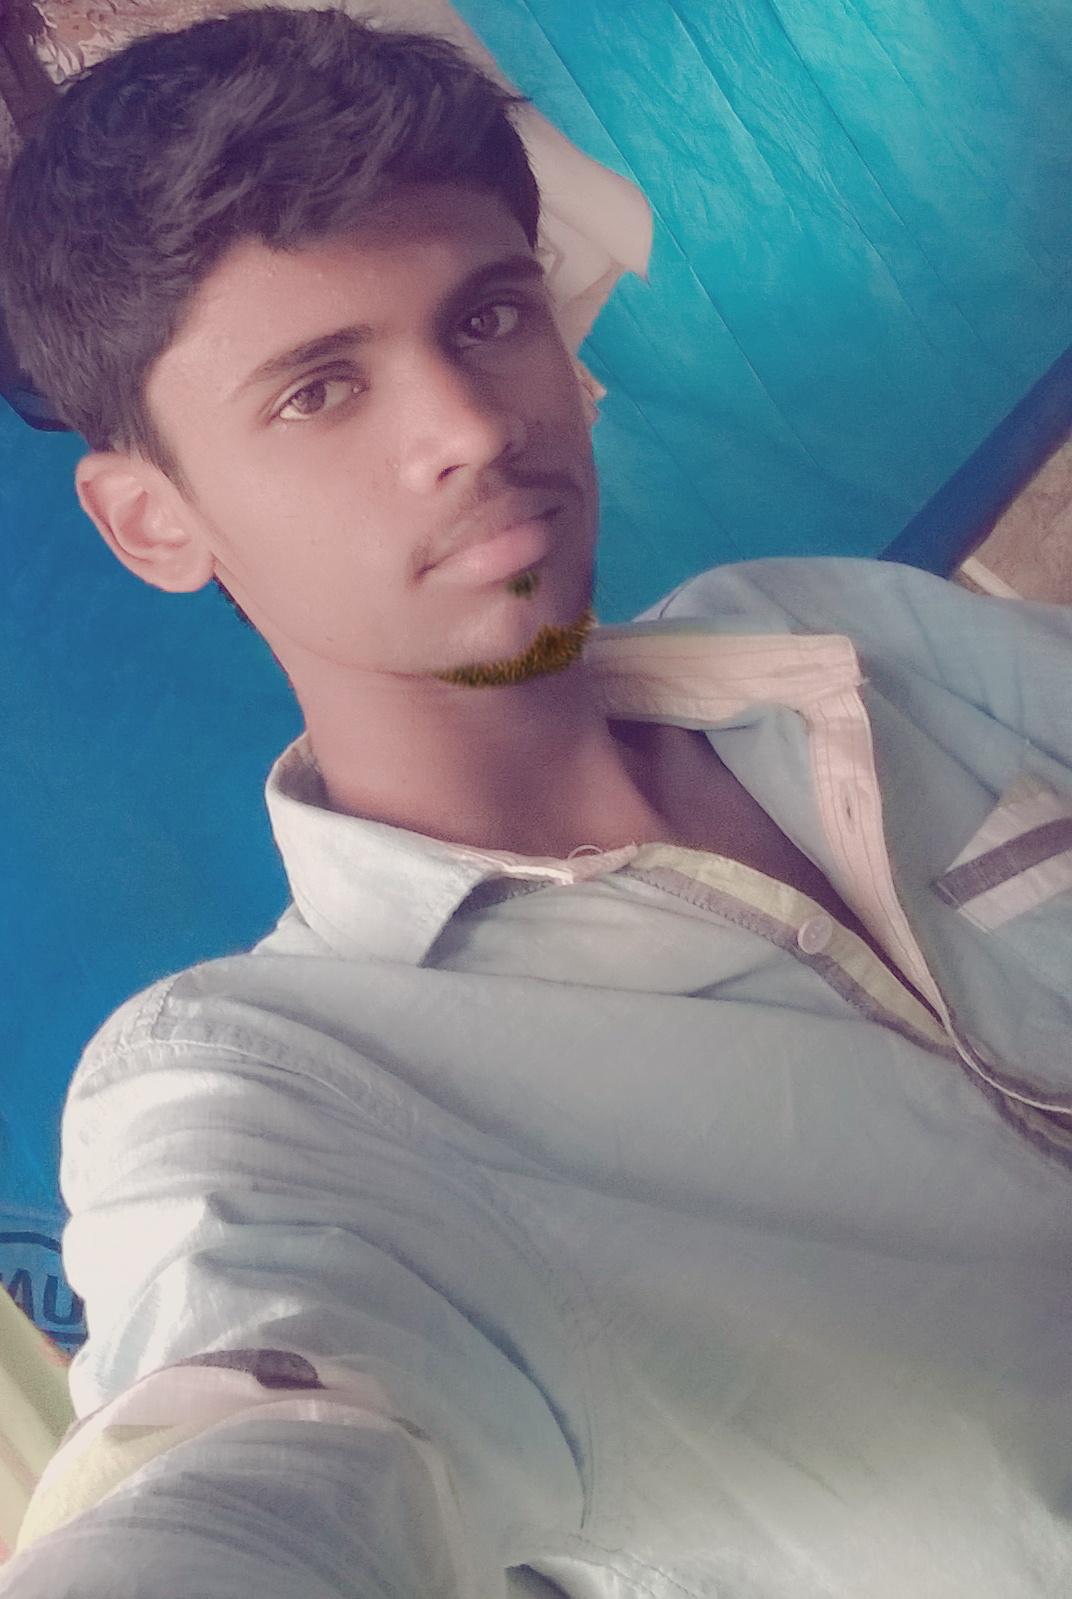 Chandru Alan